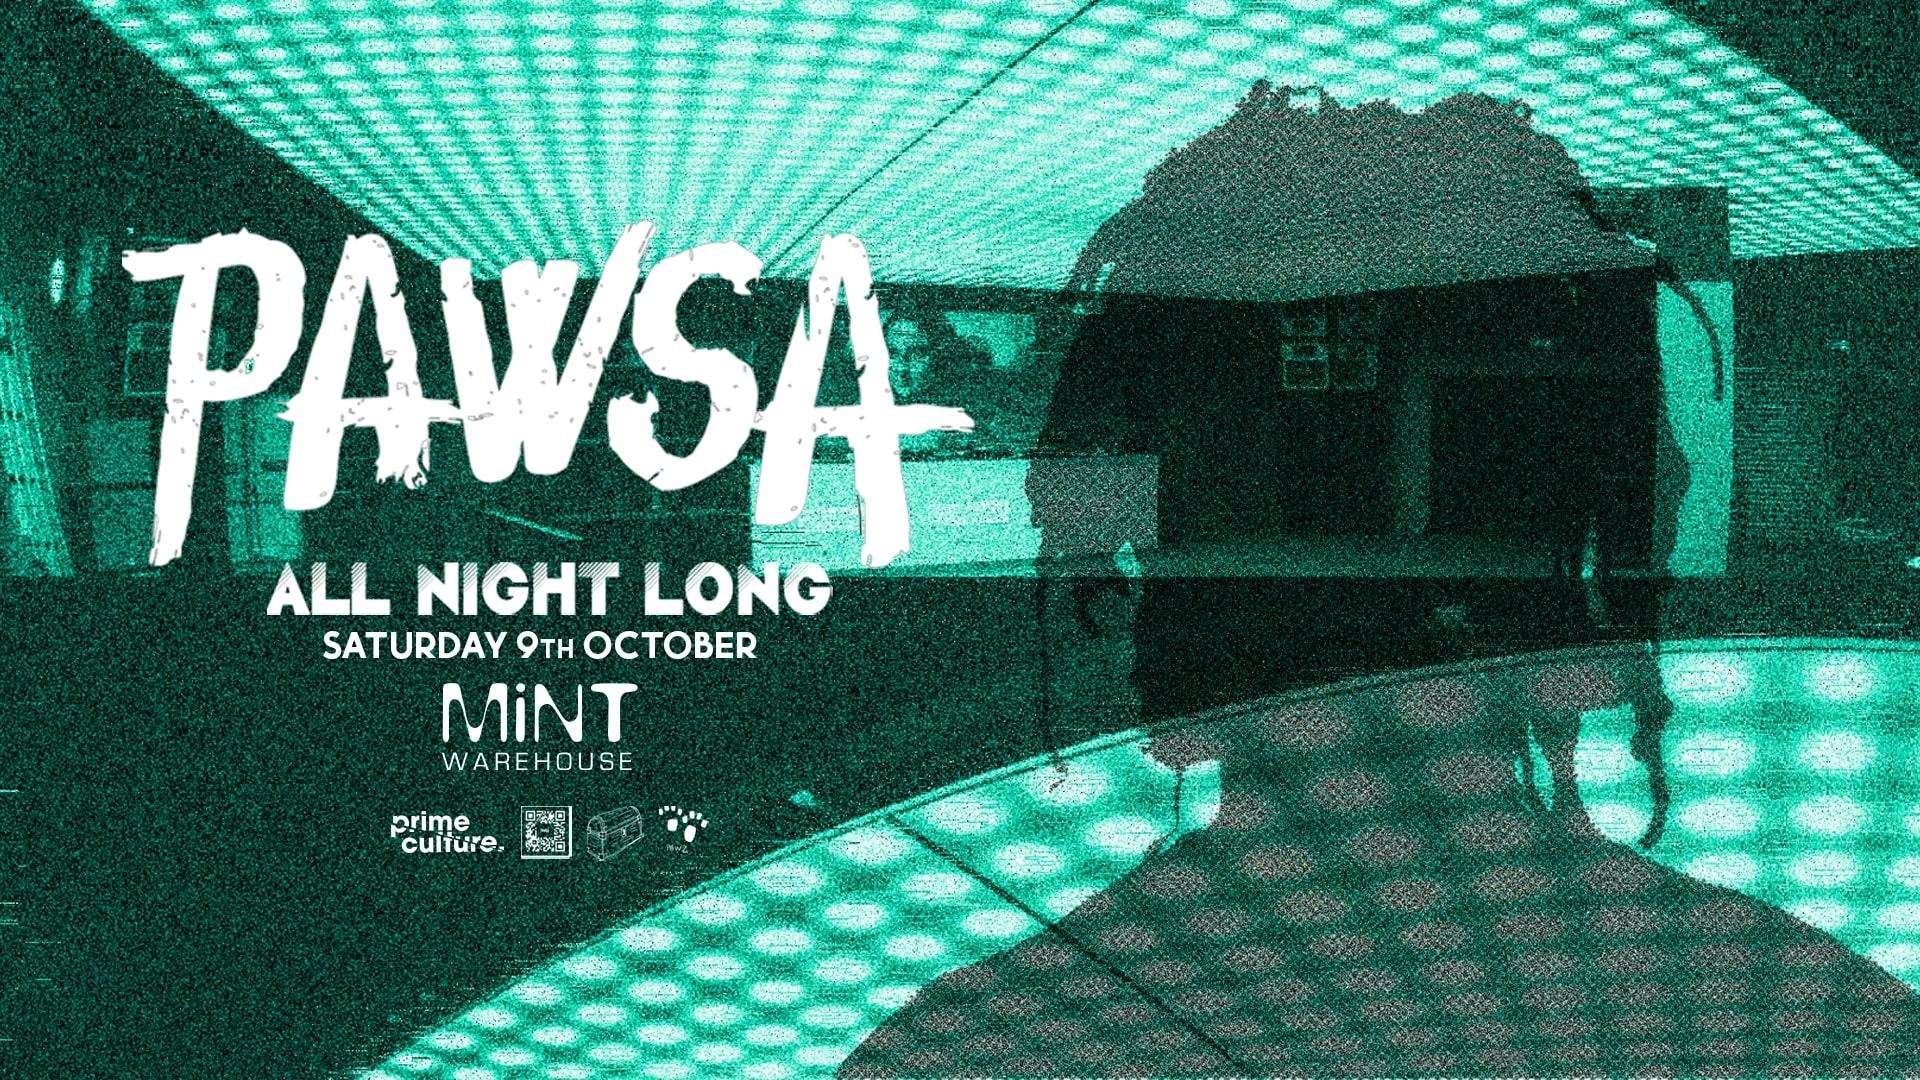 PAWSA (ALL NIGHT LONG)